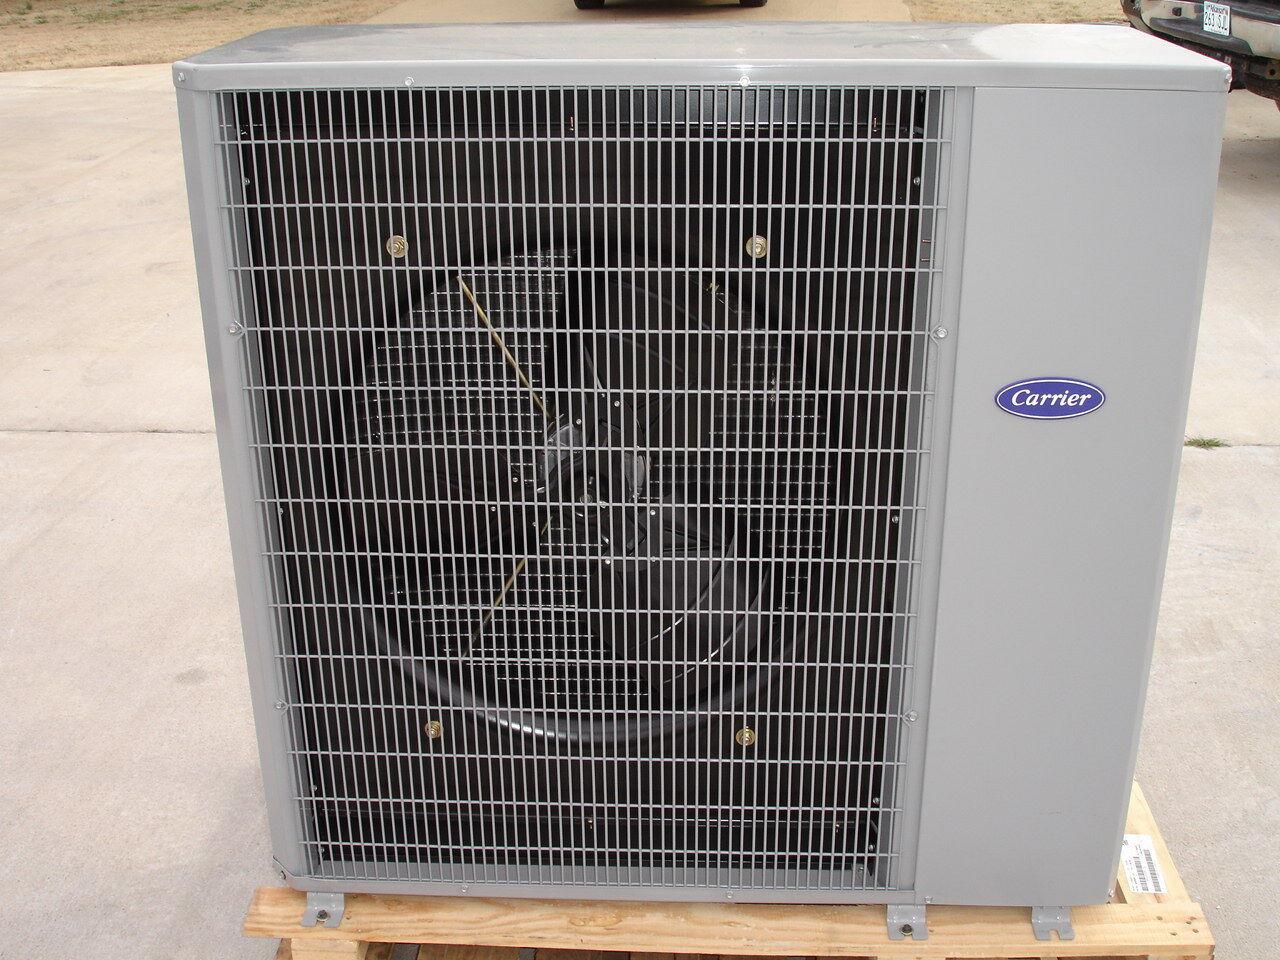 lennox 5 ton ac unit cost. carrier 38hdr048-321 air conditioner mini split outdoor unit 48k btu 230 1 phase lennox 5 ton ac cost